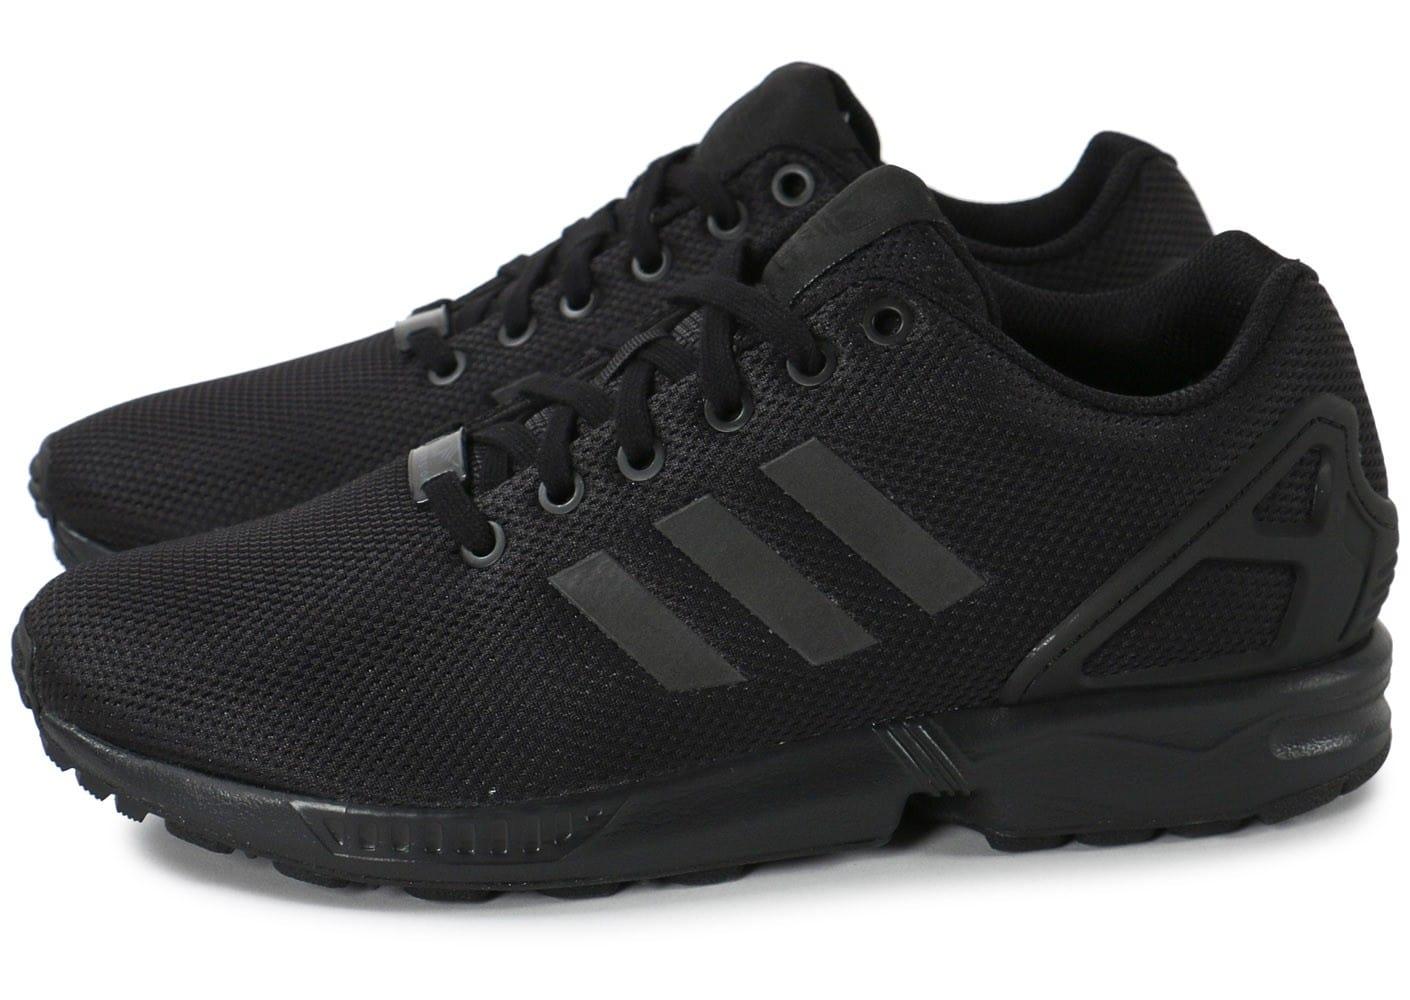 adidas zx flux noir or rose